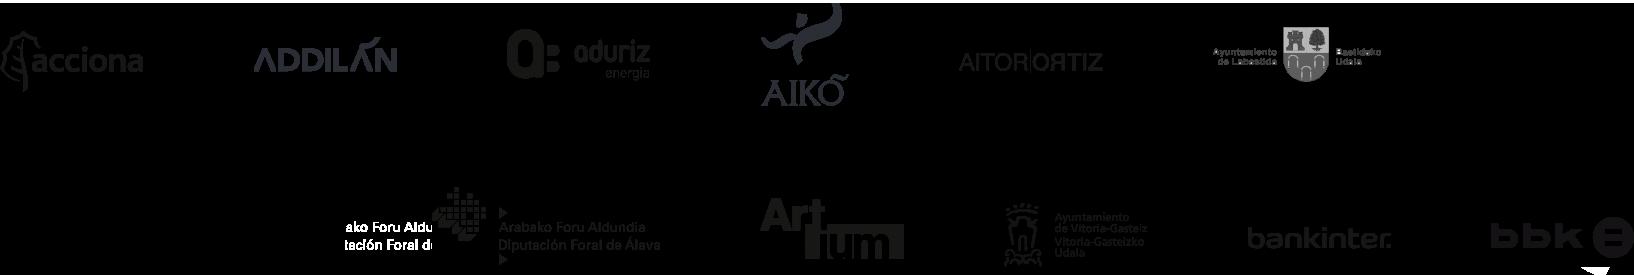 Logos_web_2020_1